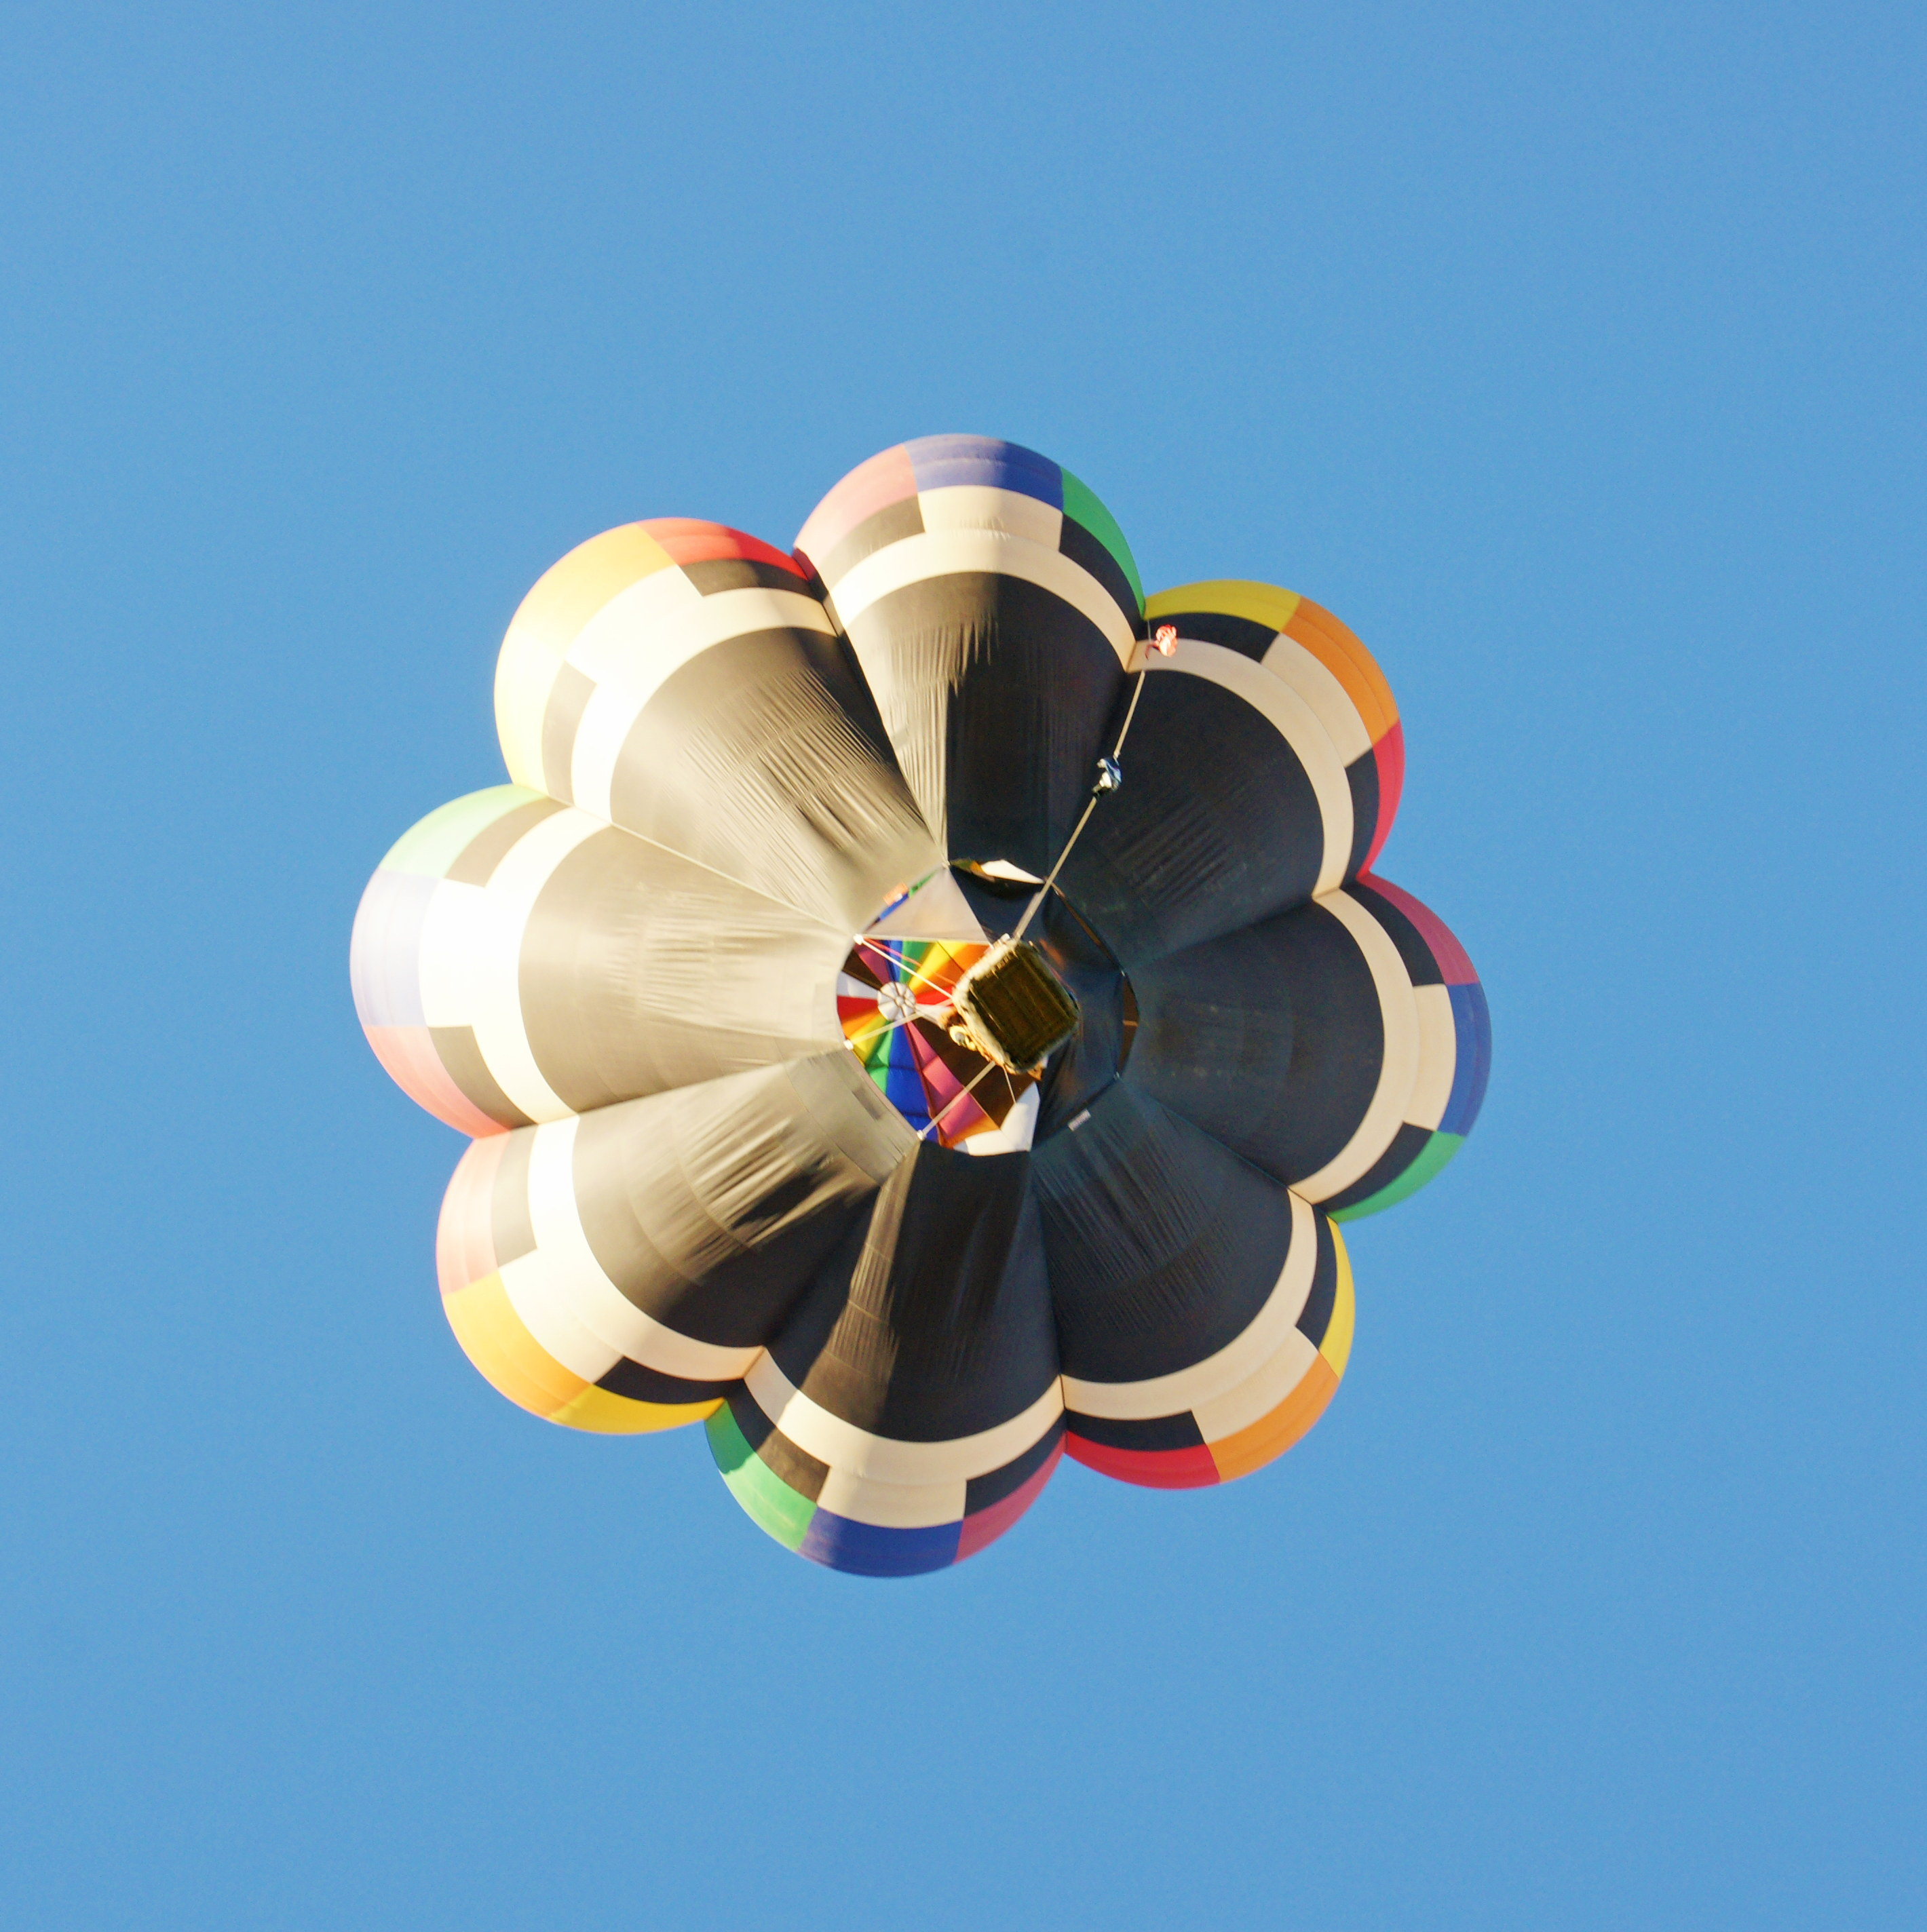 aibf-Single-Balloons-Gallery14